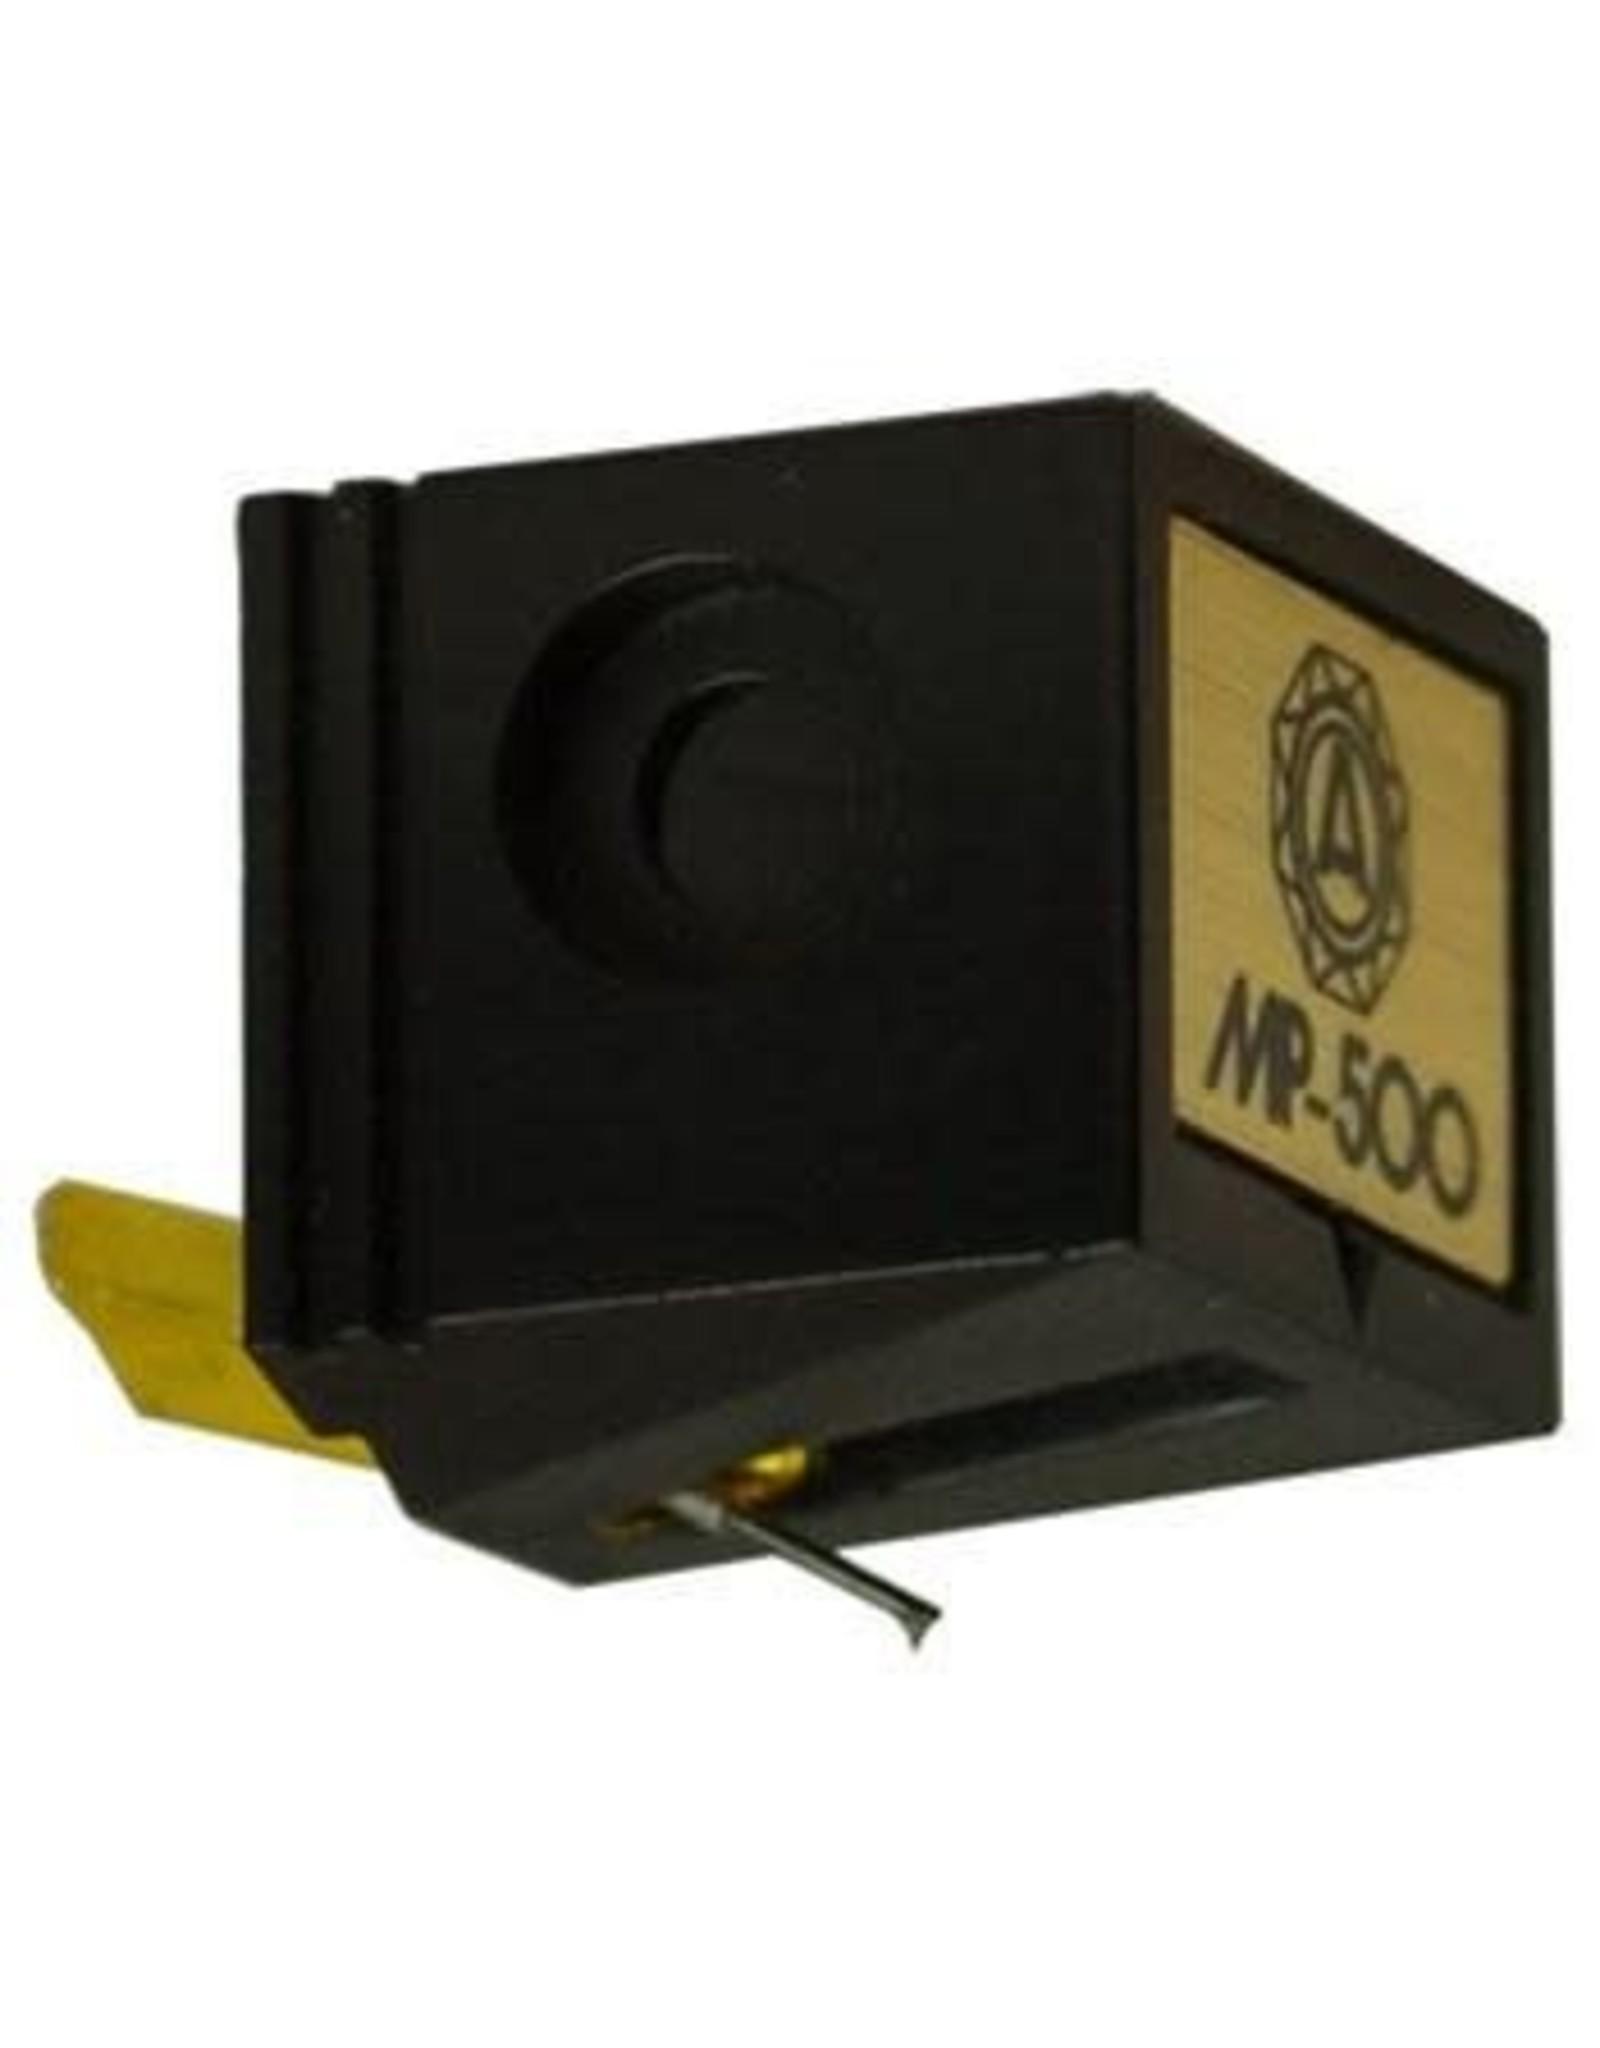 Nagaoka Nagaoka JN-P500 Phono Stylus